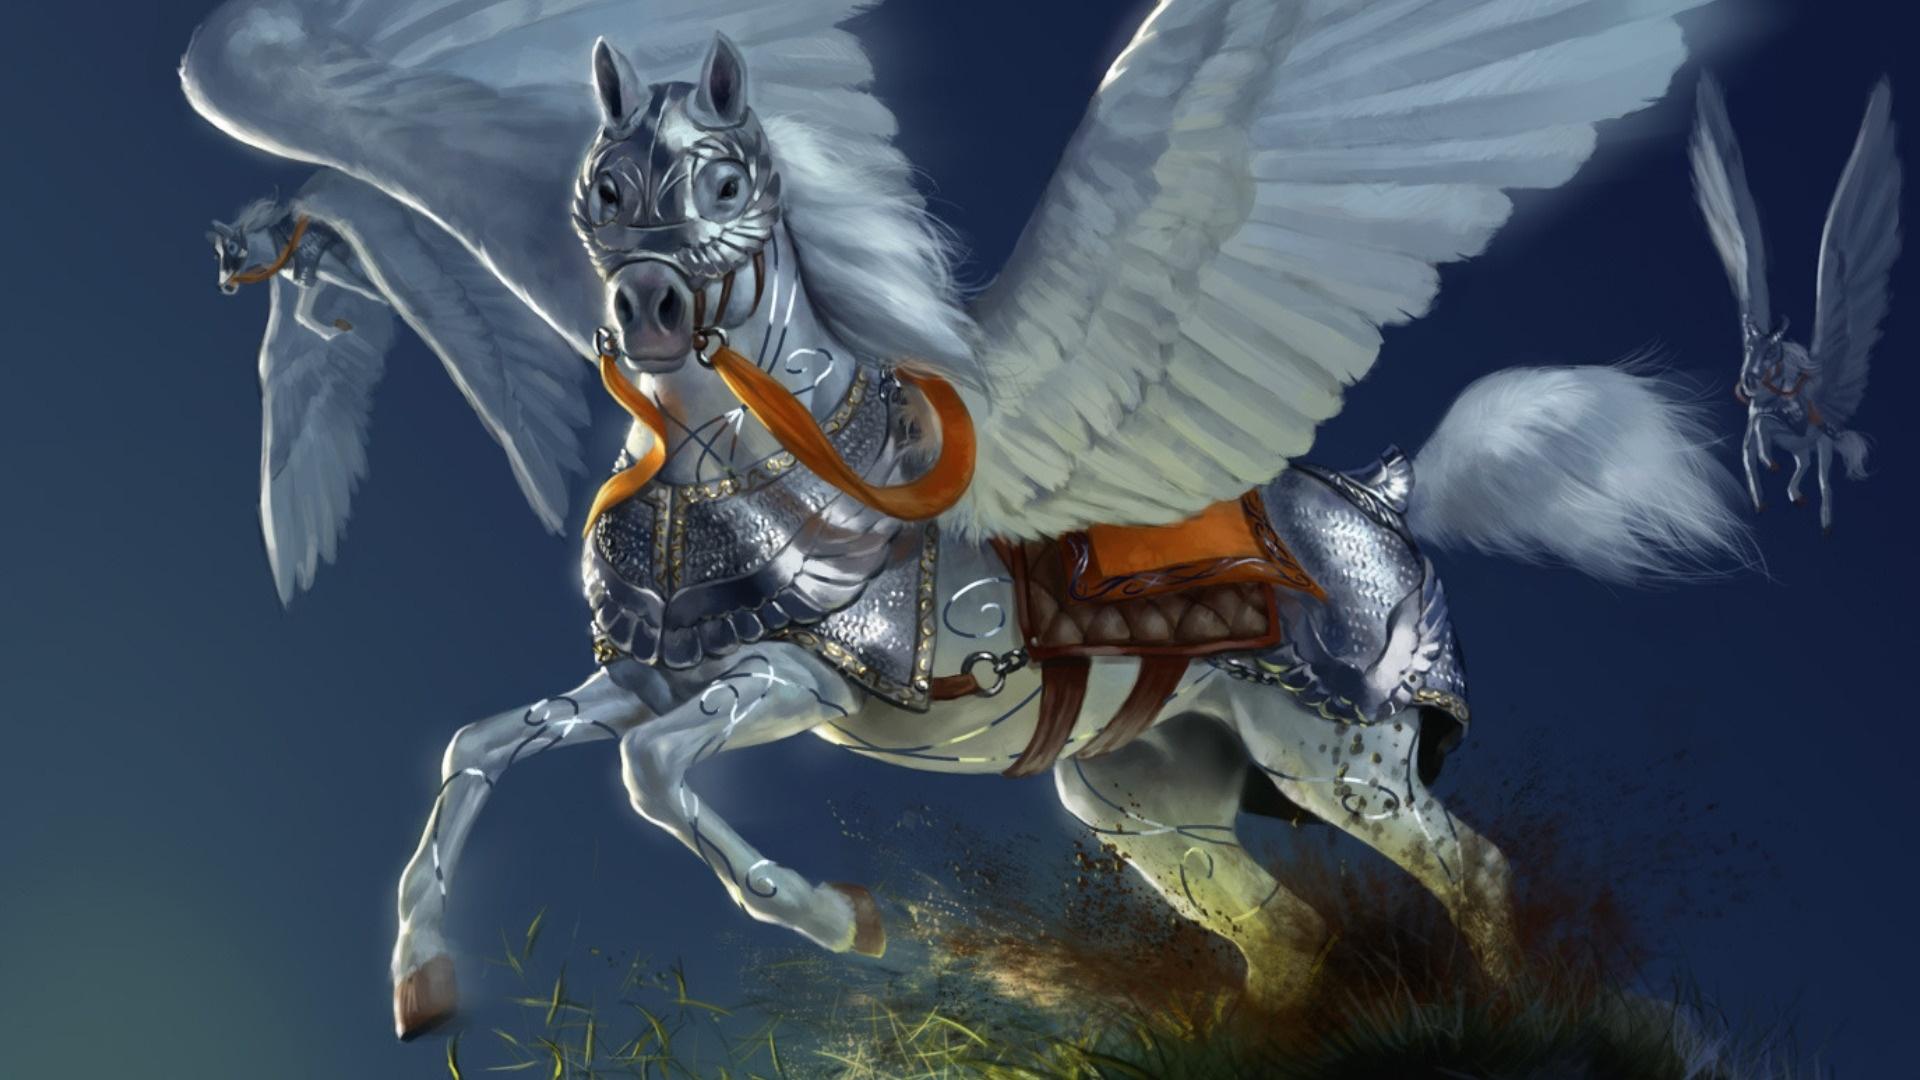 Pegasus Art wallpaper photo hd